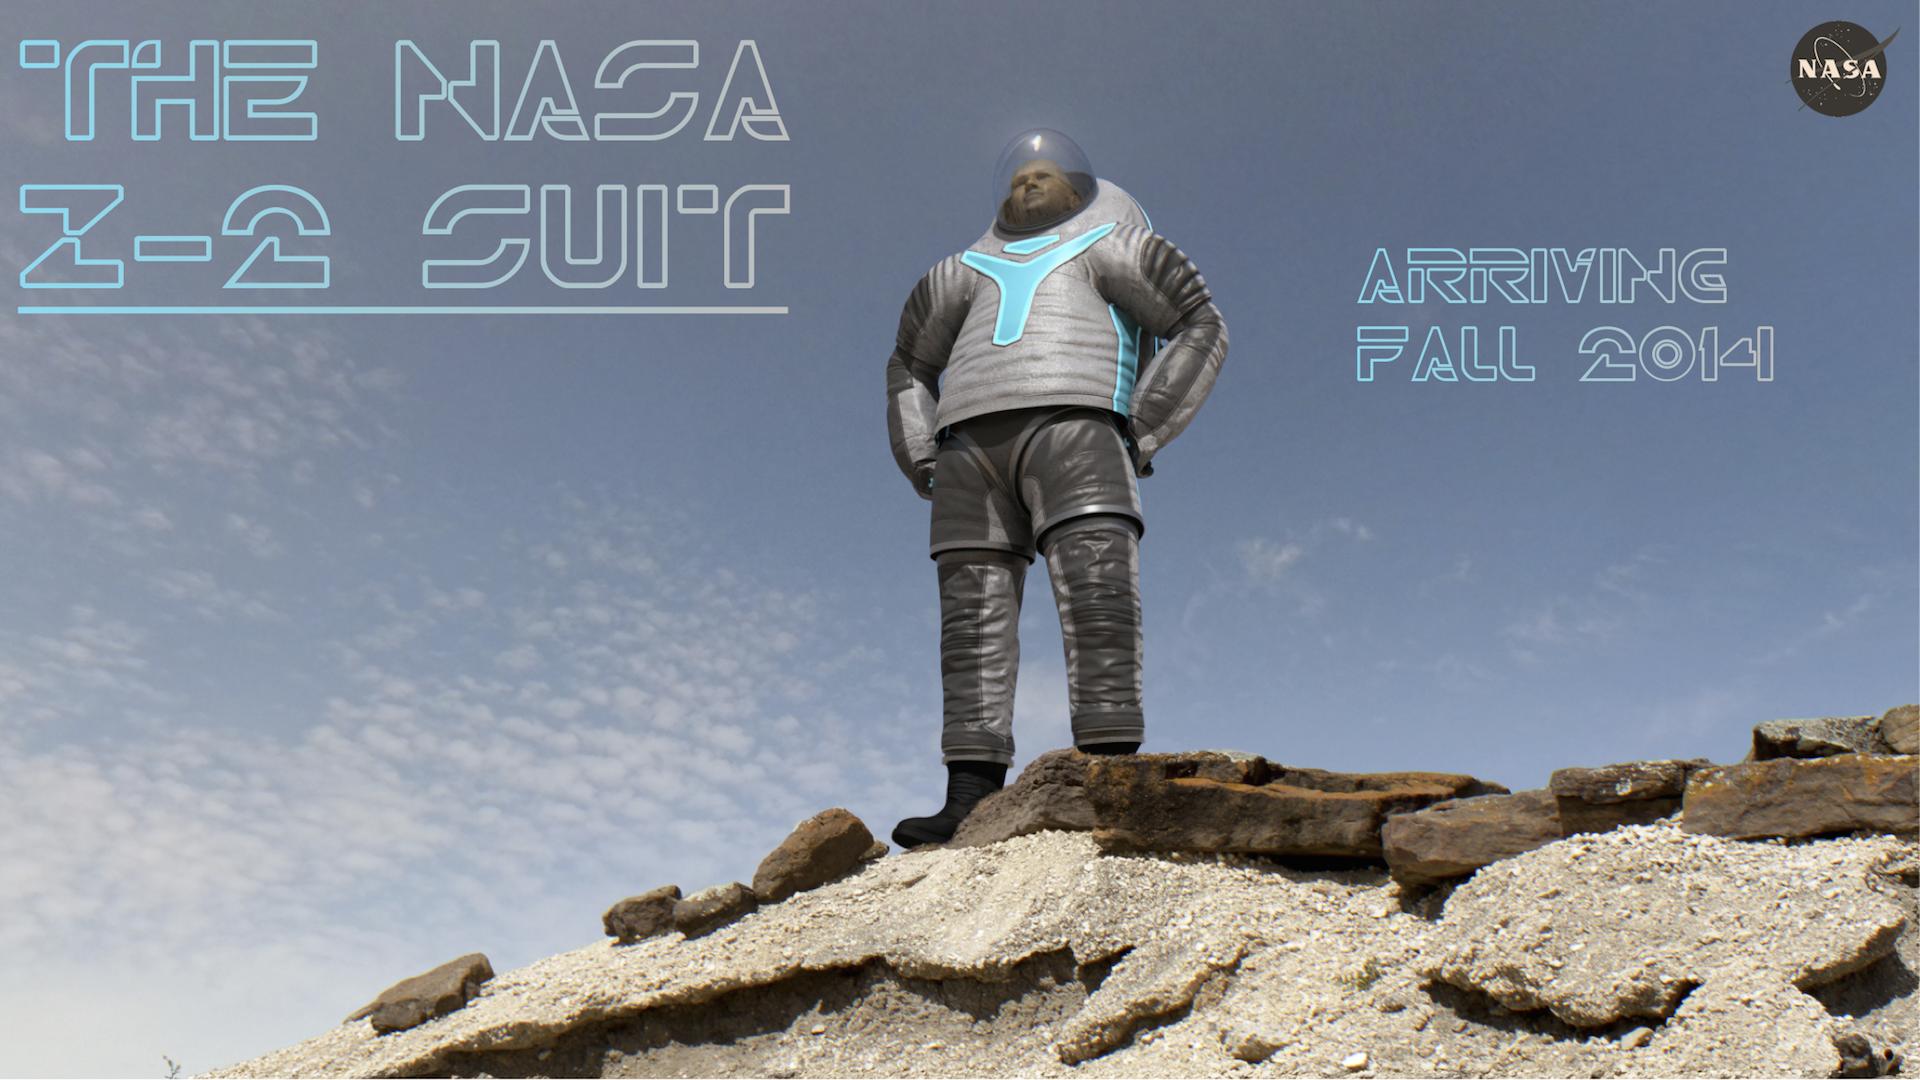 NASA\'s Next Prototype Spacesuit Has a Brand New Look | NASA